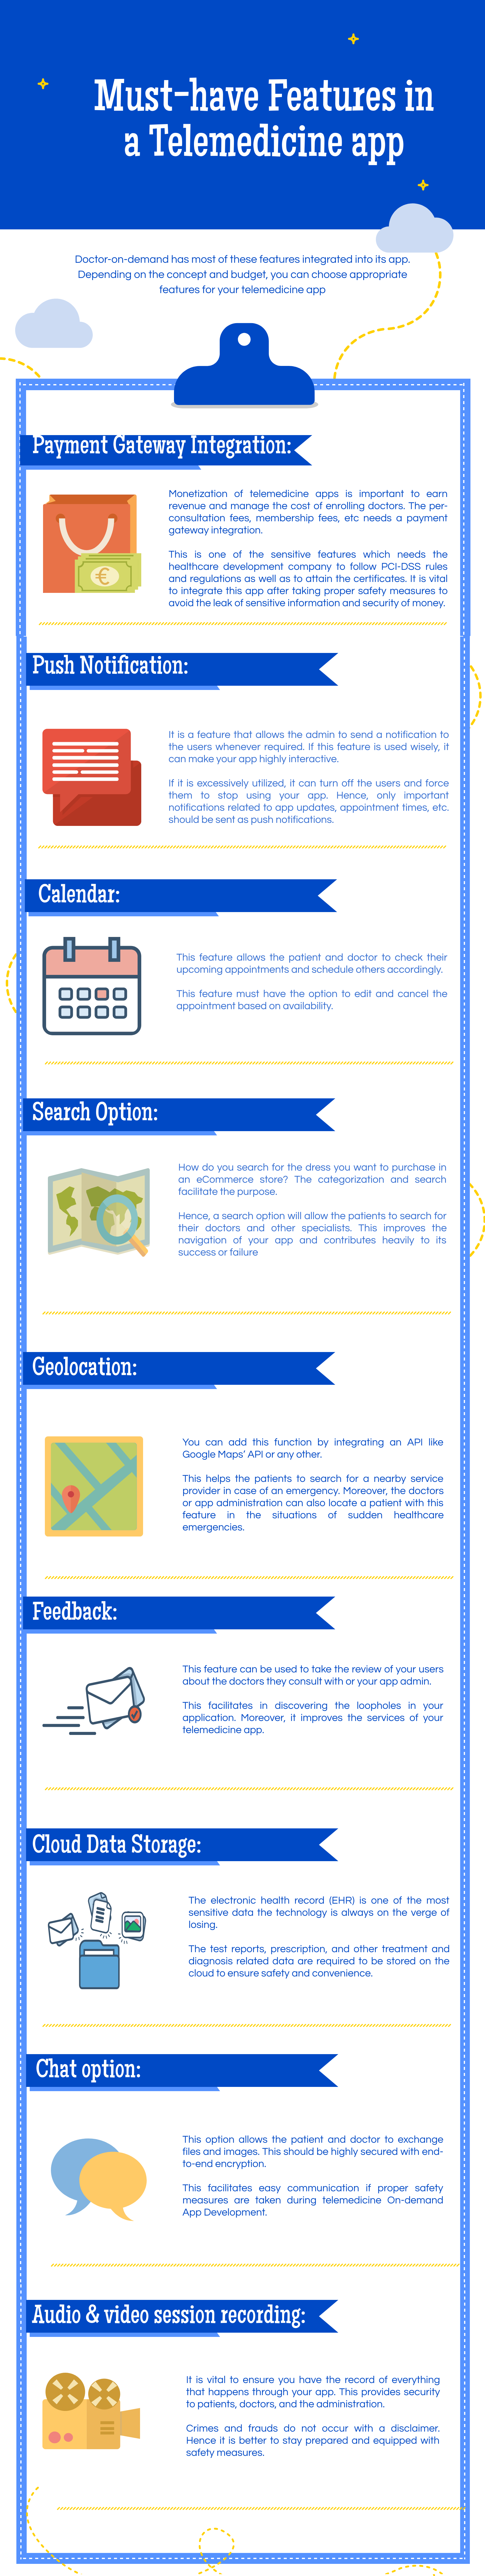 features telemedicine app